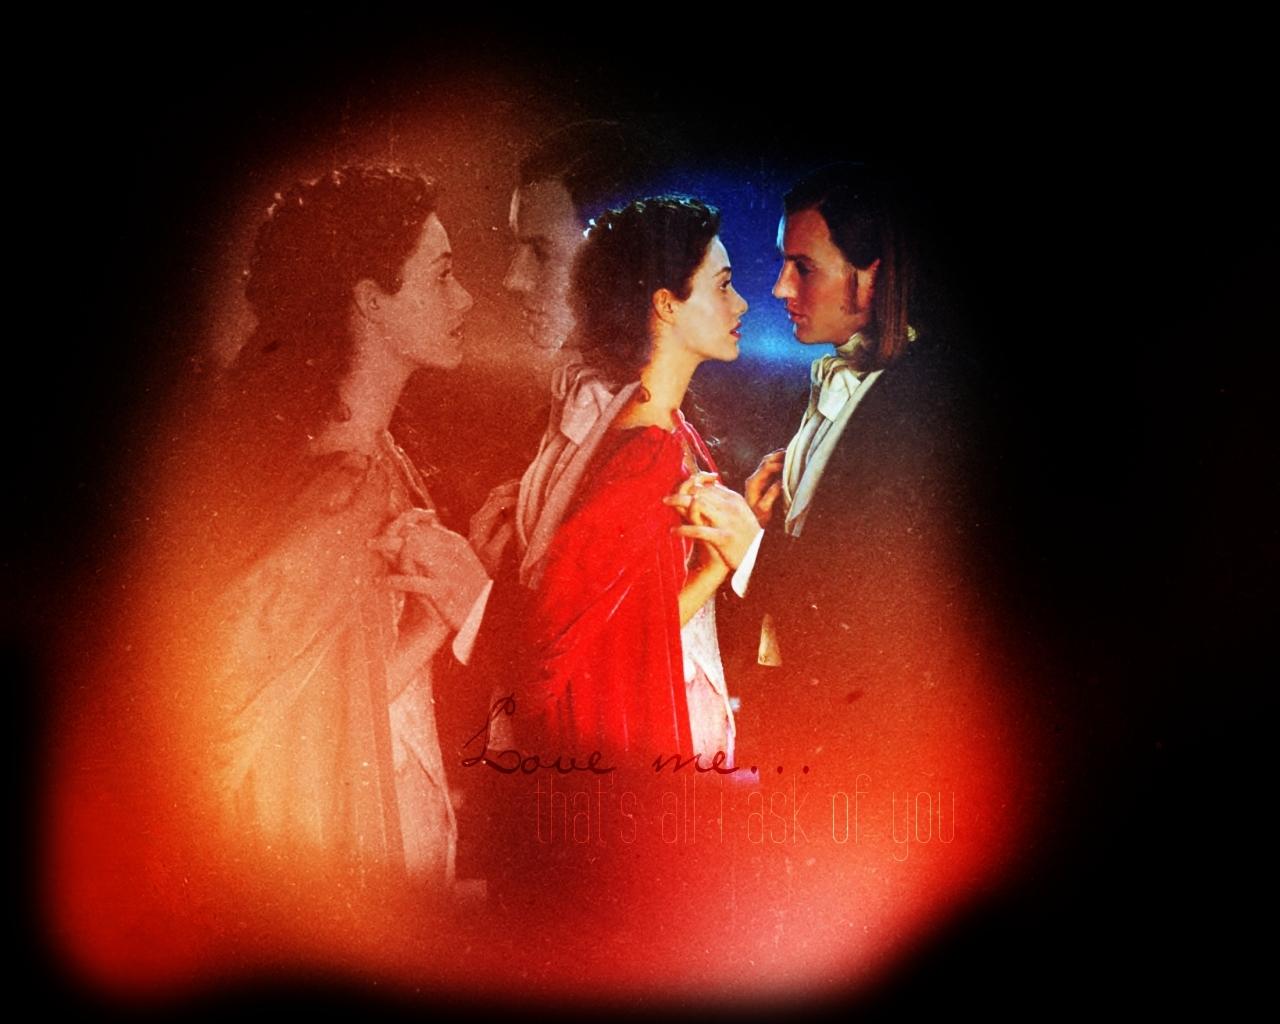 Christine x Phantom - ALWs Phantom of the Opera movie Fan